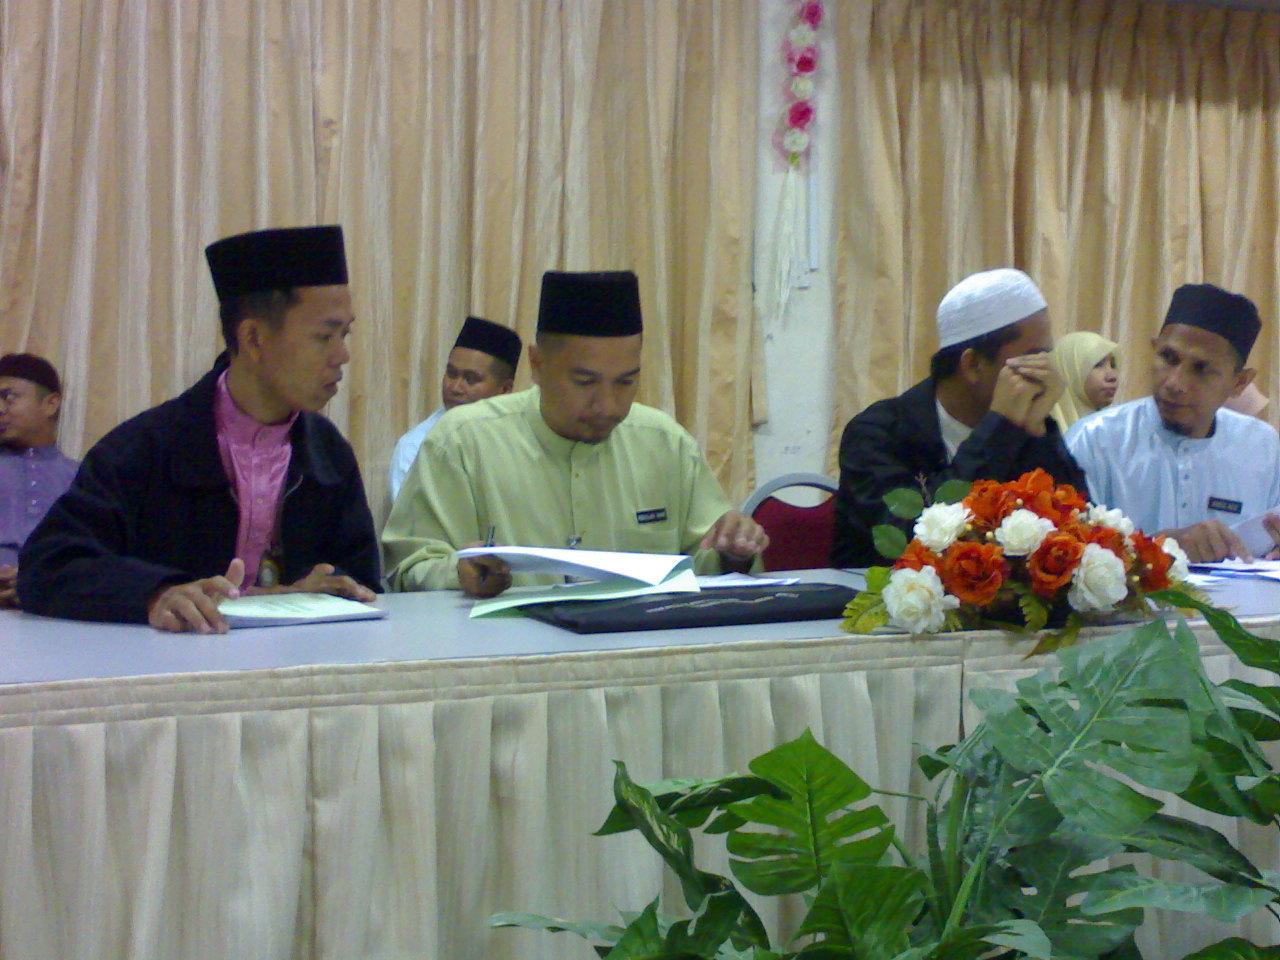 tawau muslim Mengkaji tahap pengetahuan dan persepsi pengguna muslim terhadap  pensijilan halal pada premis makanan (restoran) di bandar tawau,.